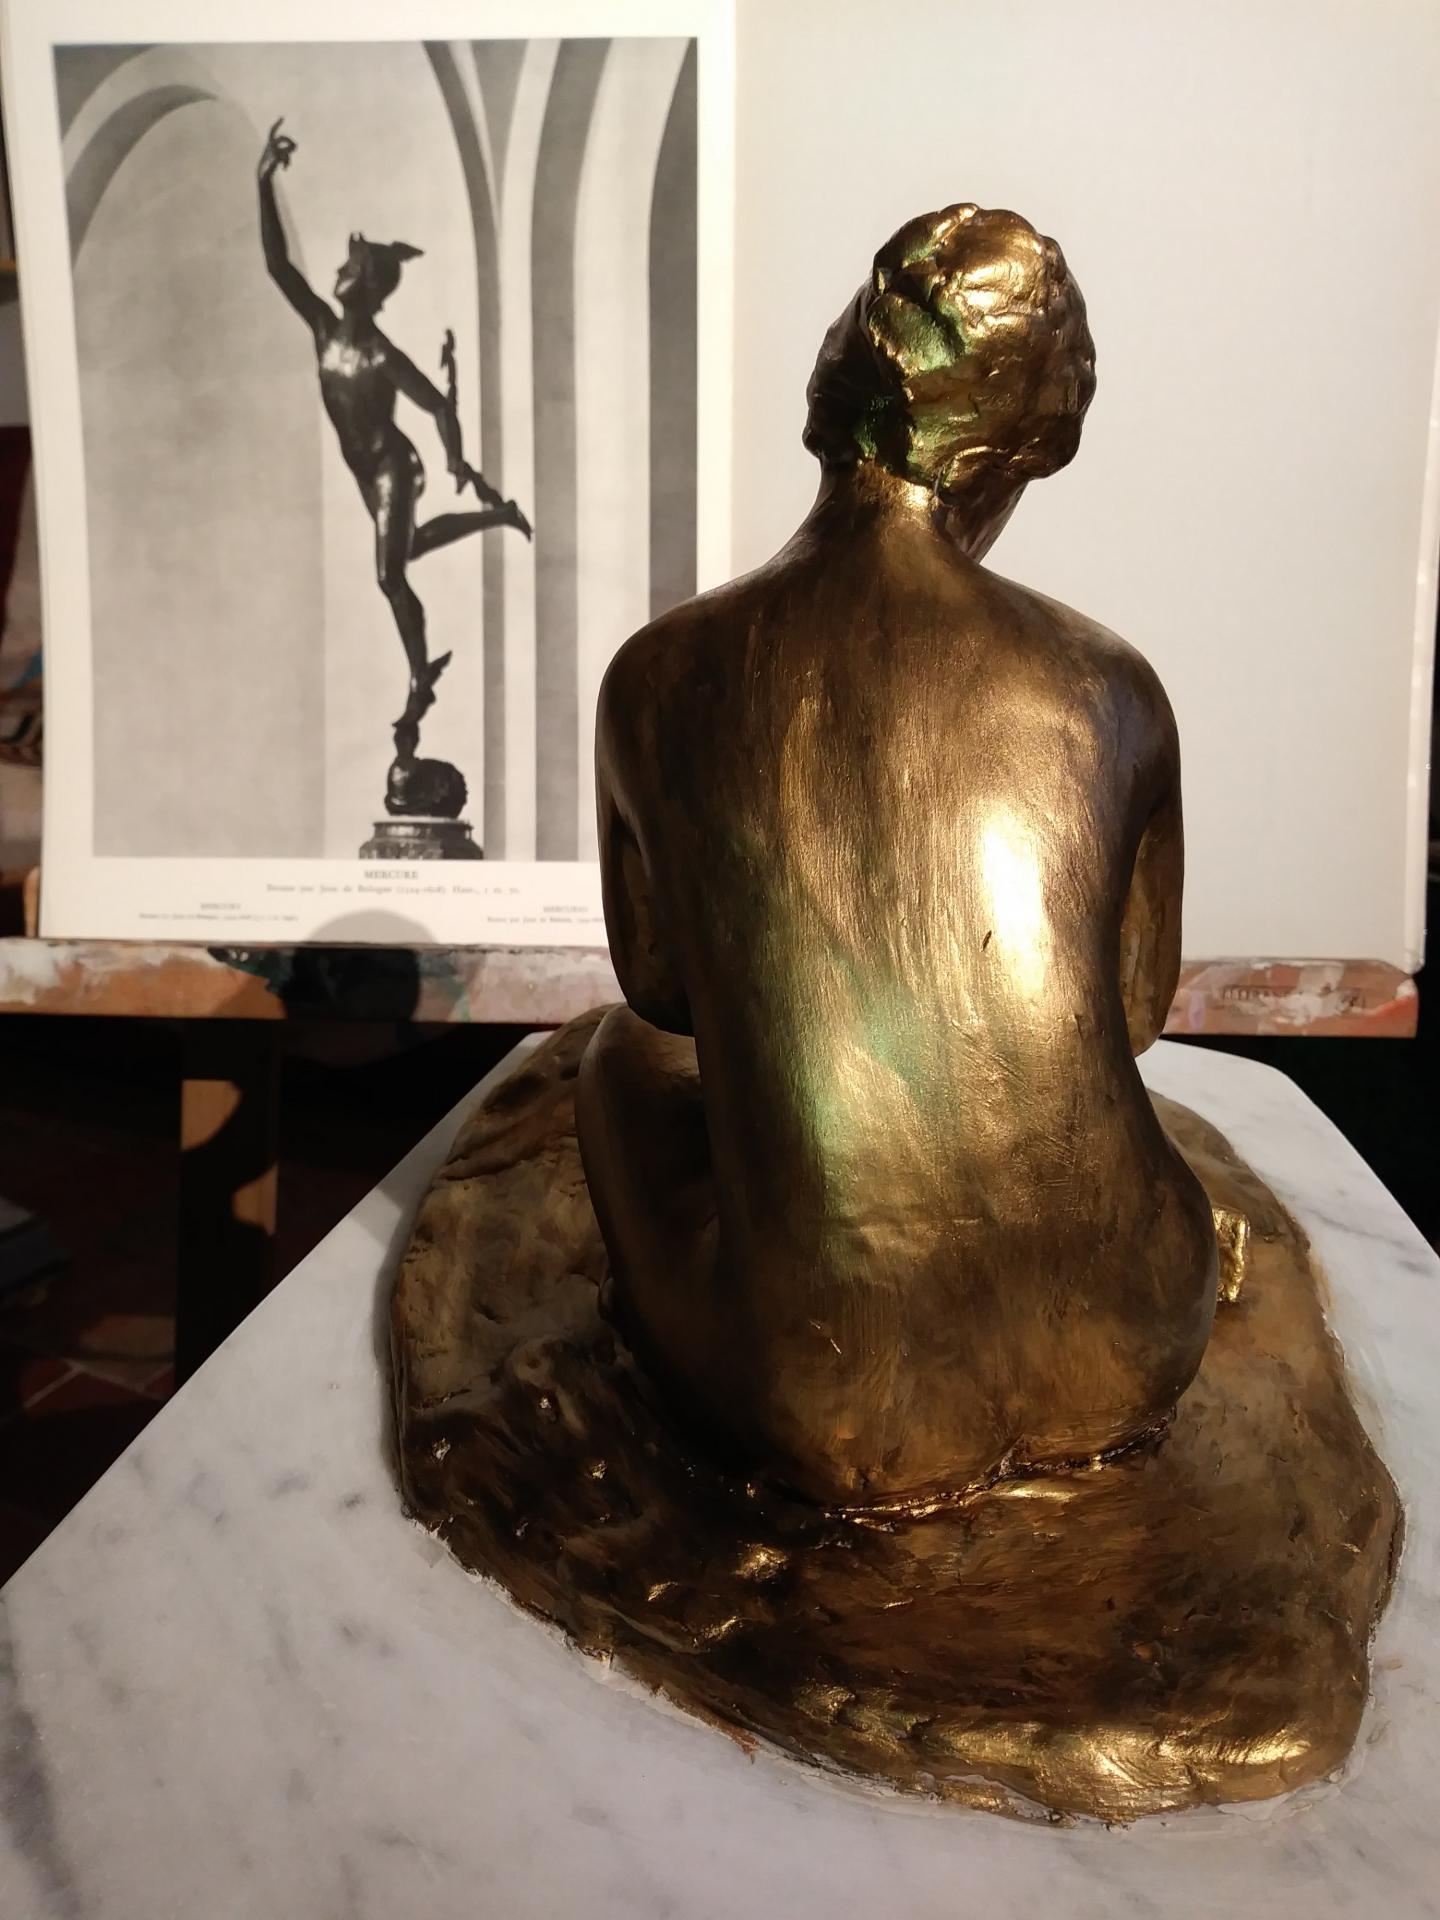 Sculpture de nue, argile patinée (baigneuse) 3